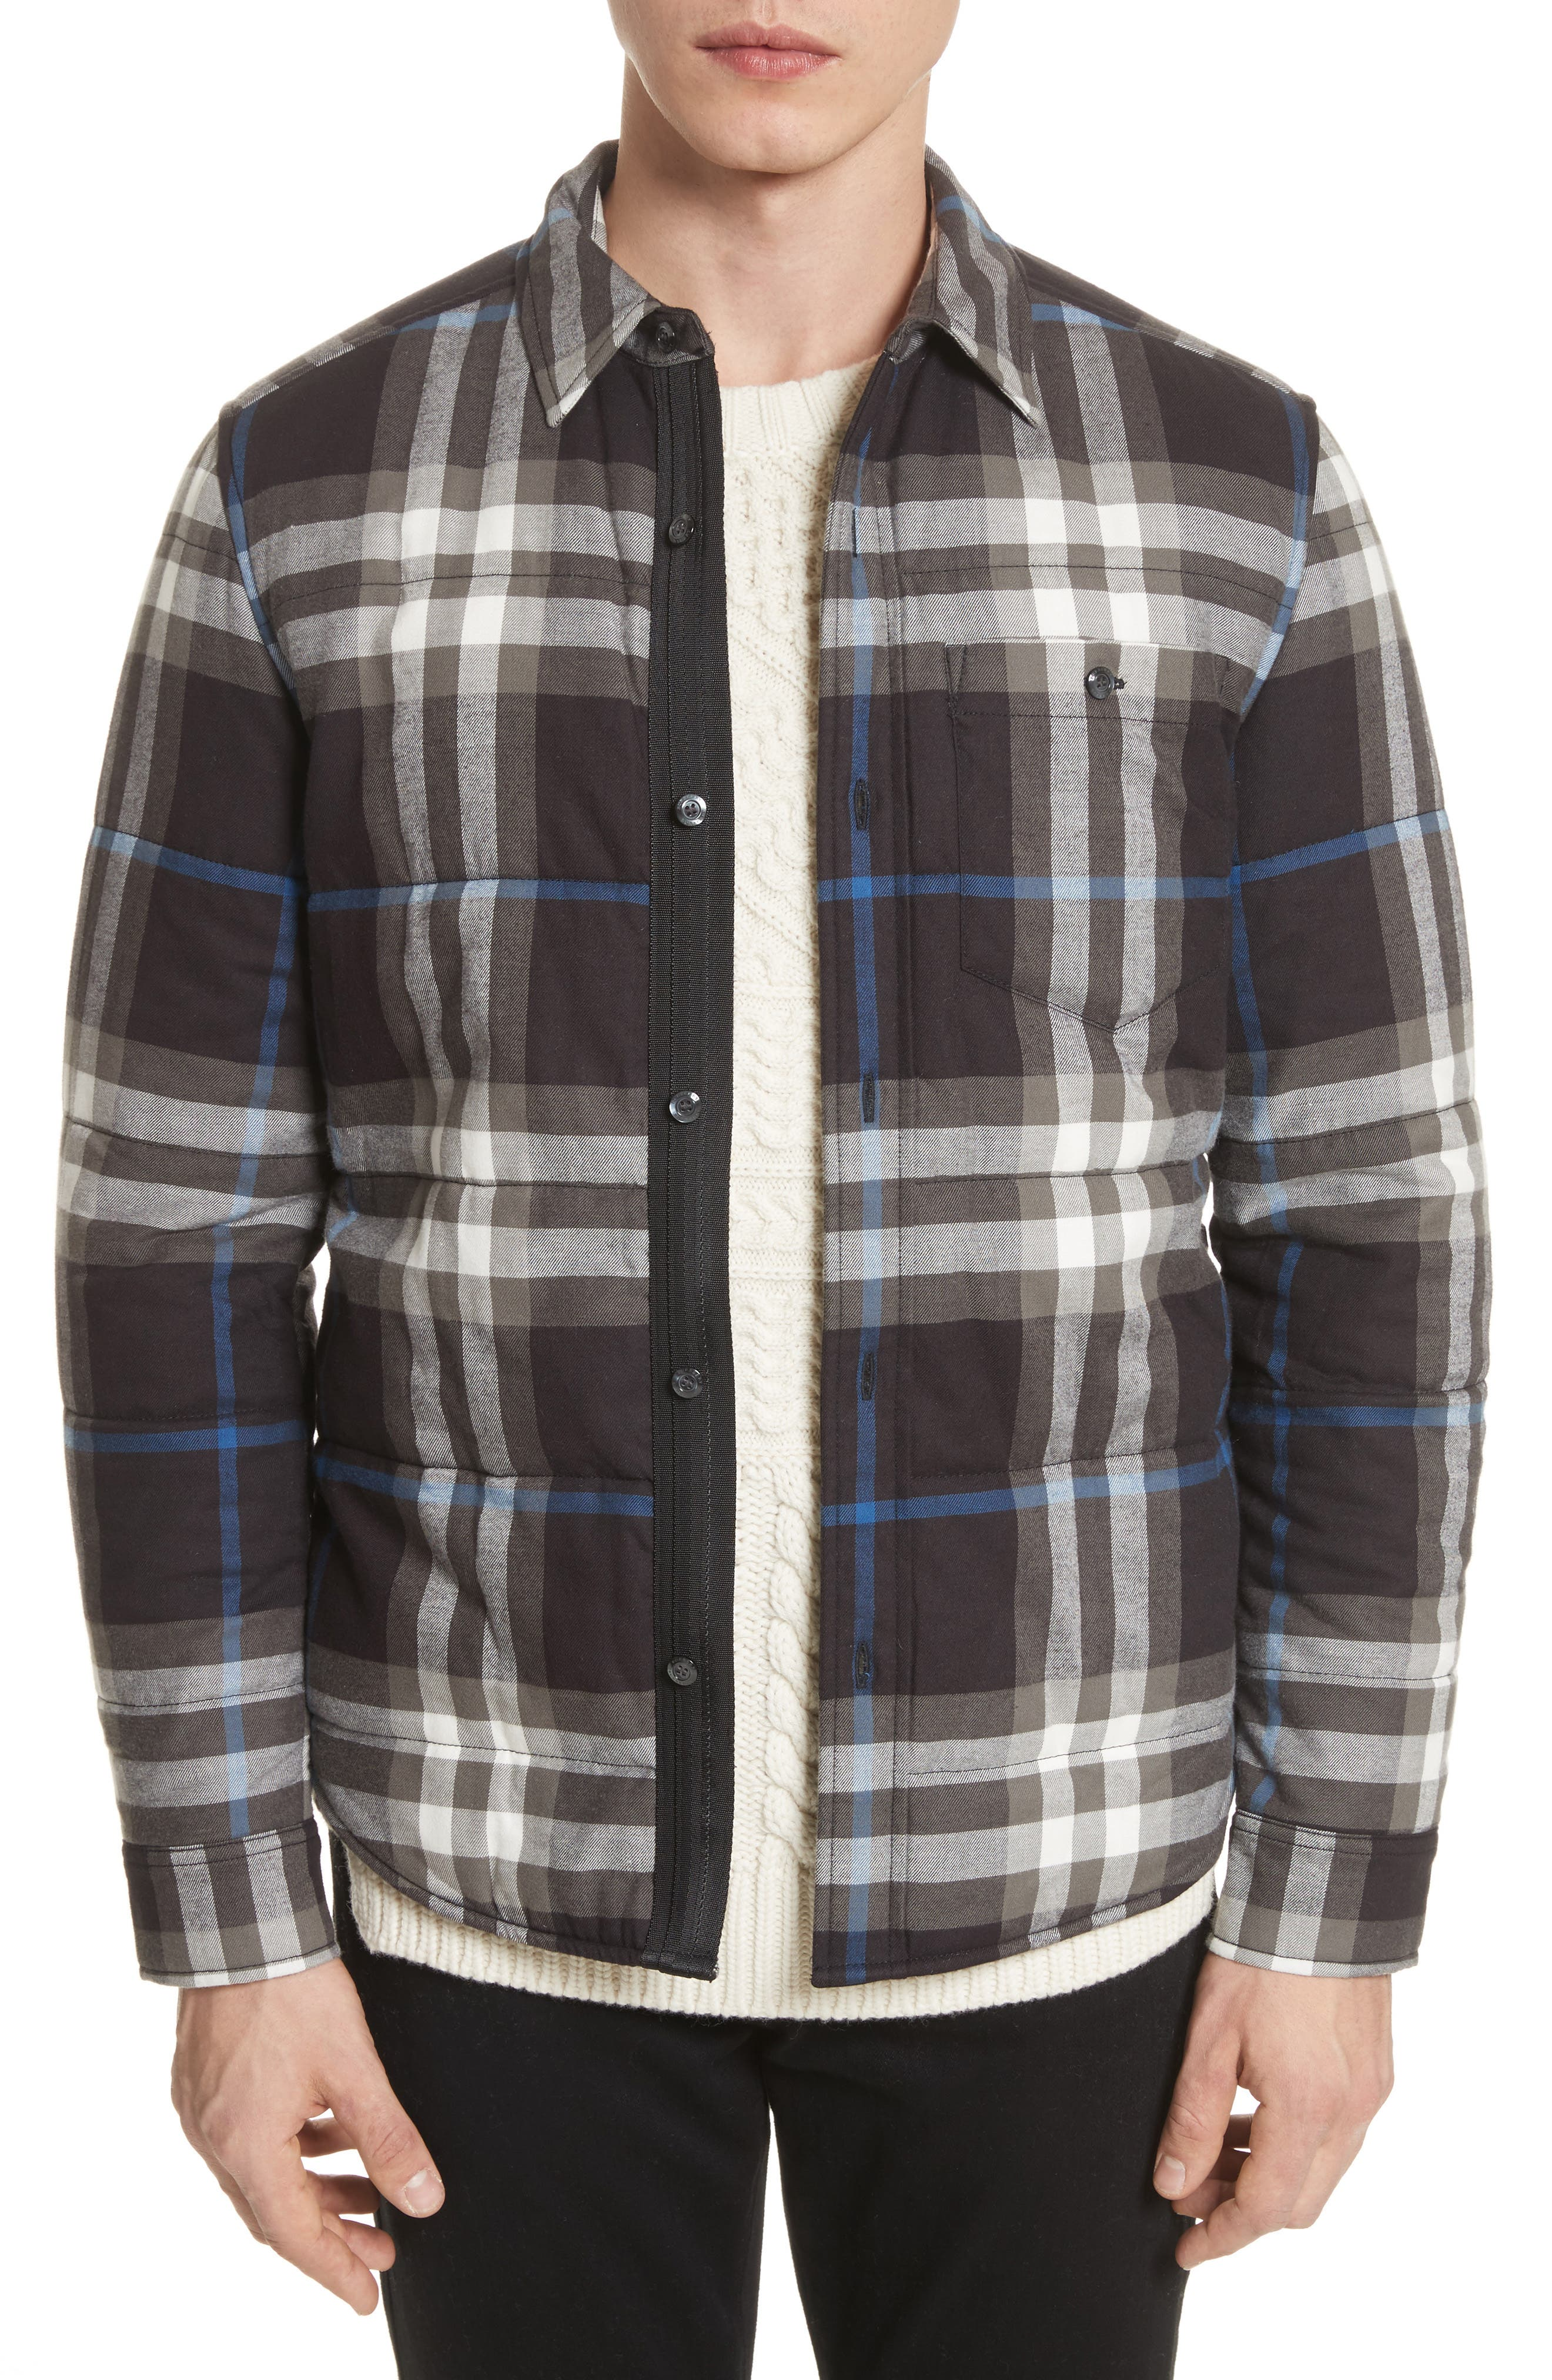 Walsden Plaid Flannel Shirt Jacket,                             Main thumbnail 1, color,                             001